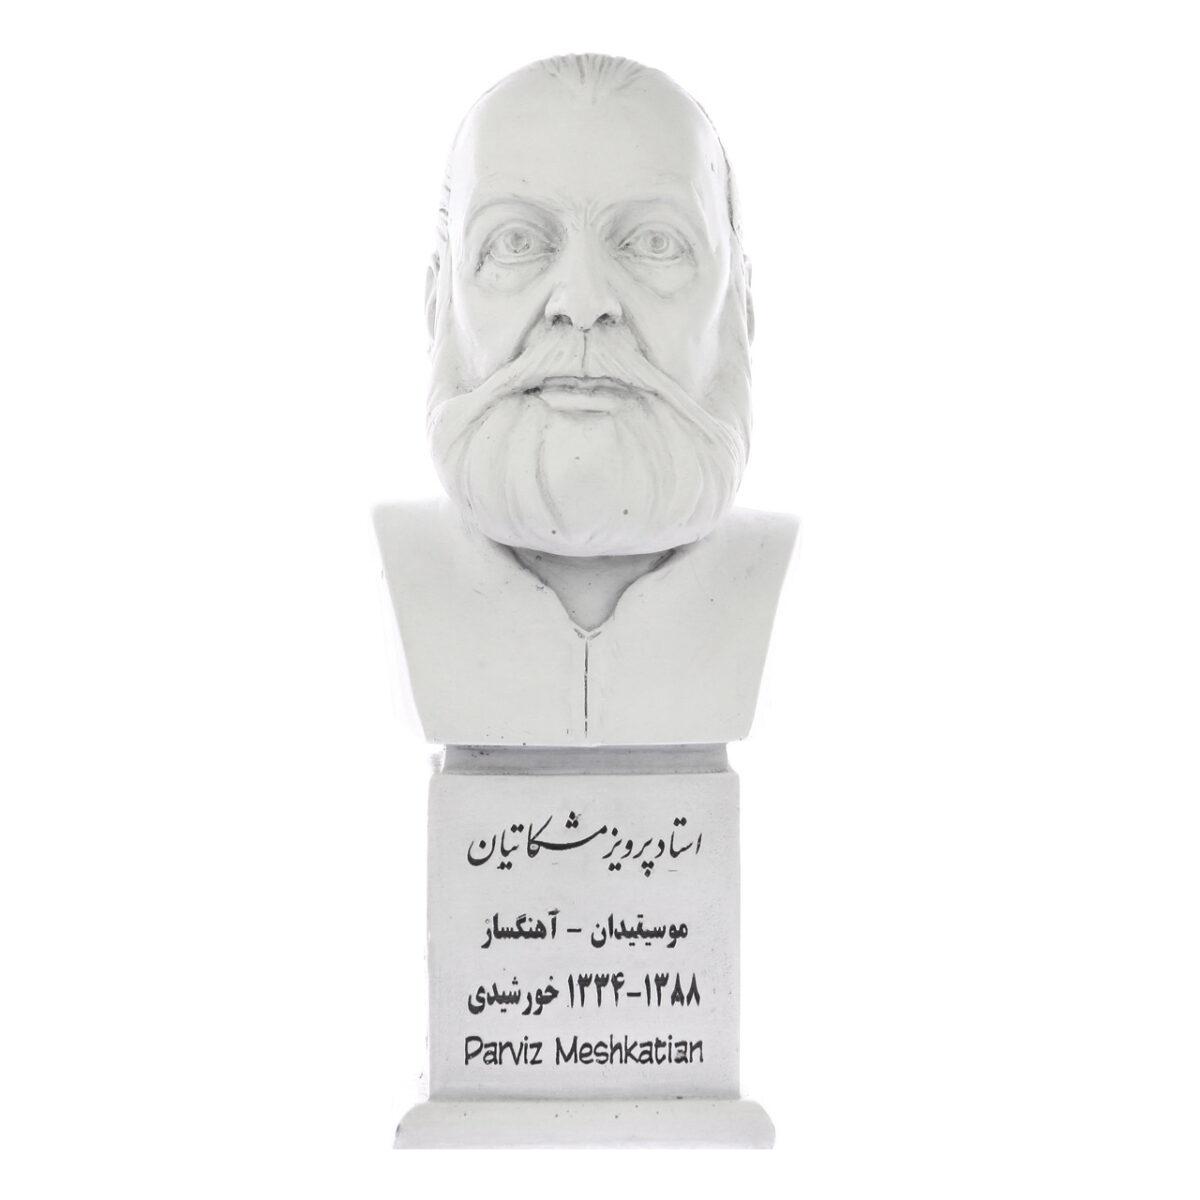 parviz meshkatian s 1200x1200 - سردیس پرویز مشکاتیان